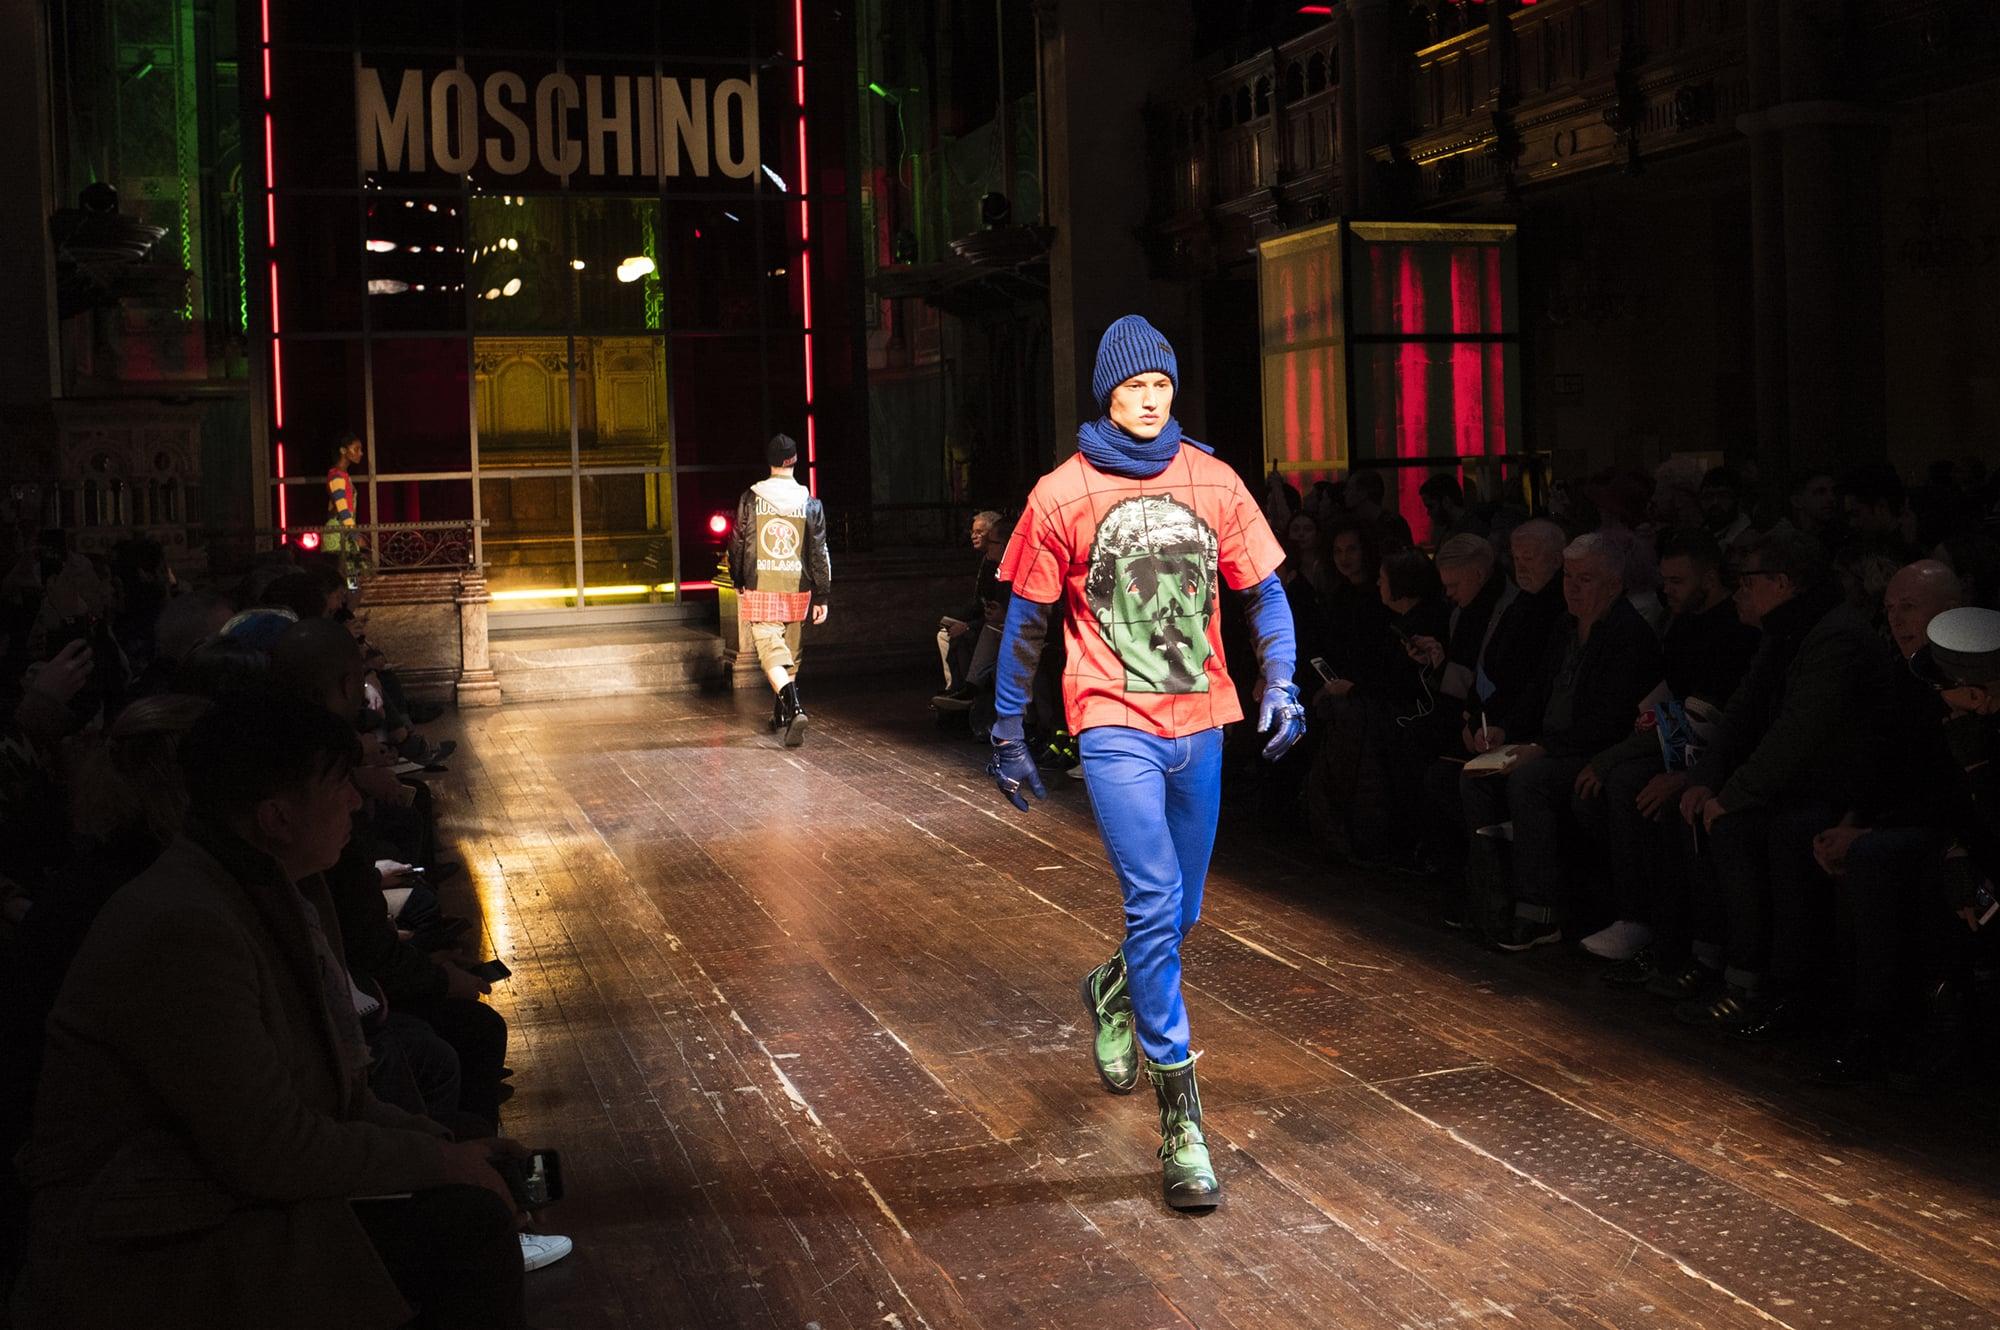 Moschino Mens aw16_24.jpg